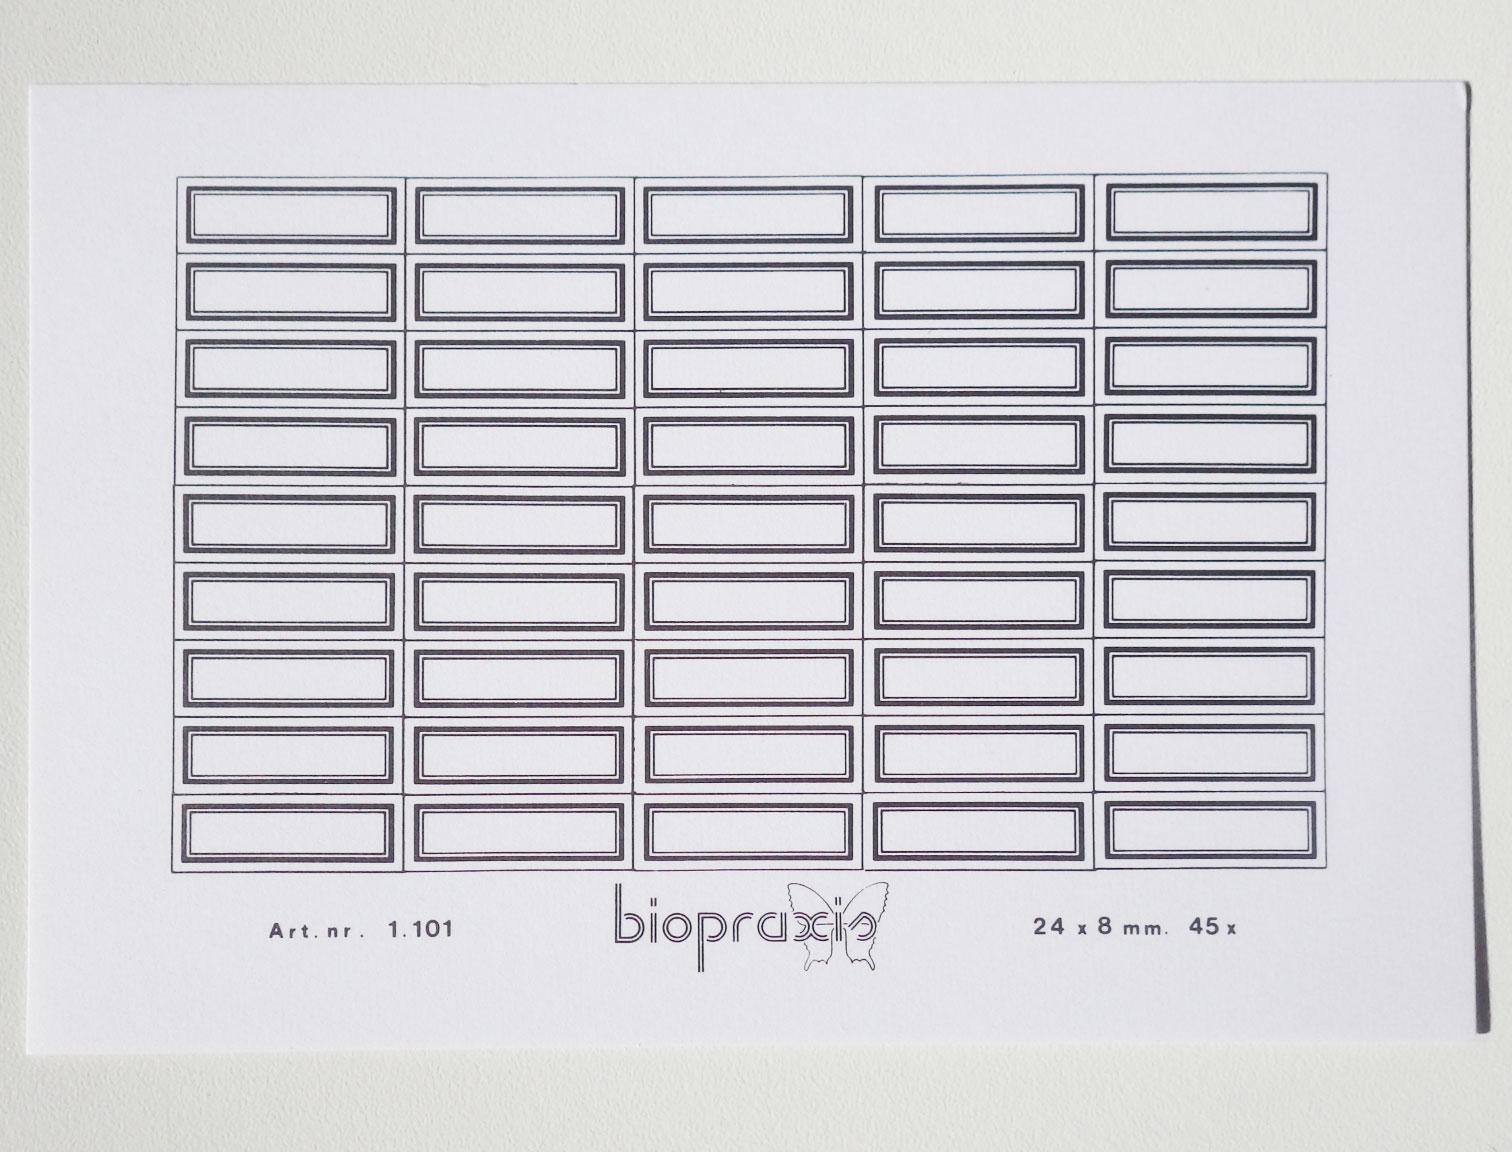 biopraxis-24x8